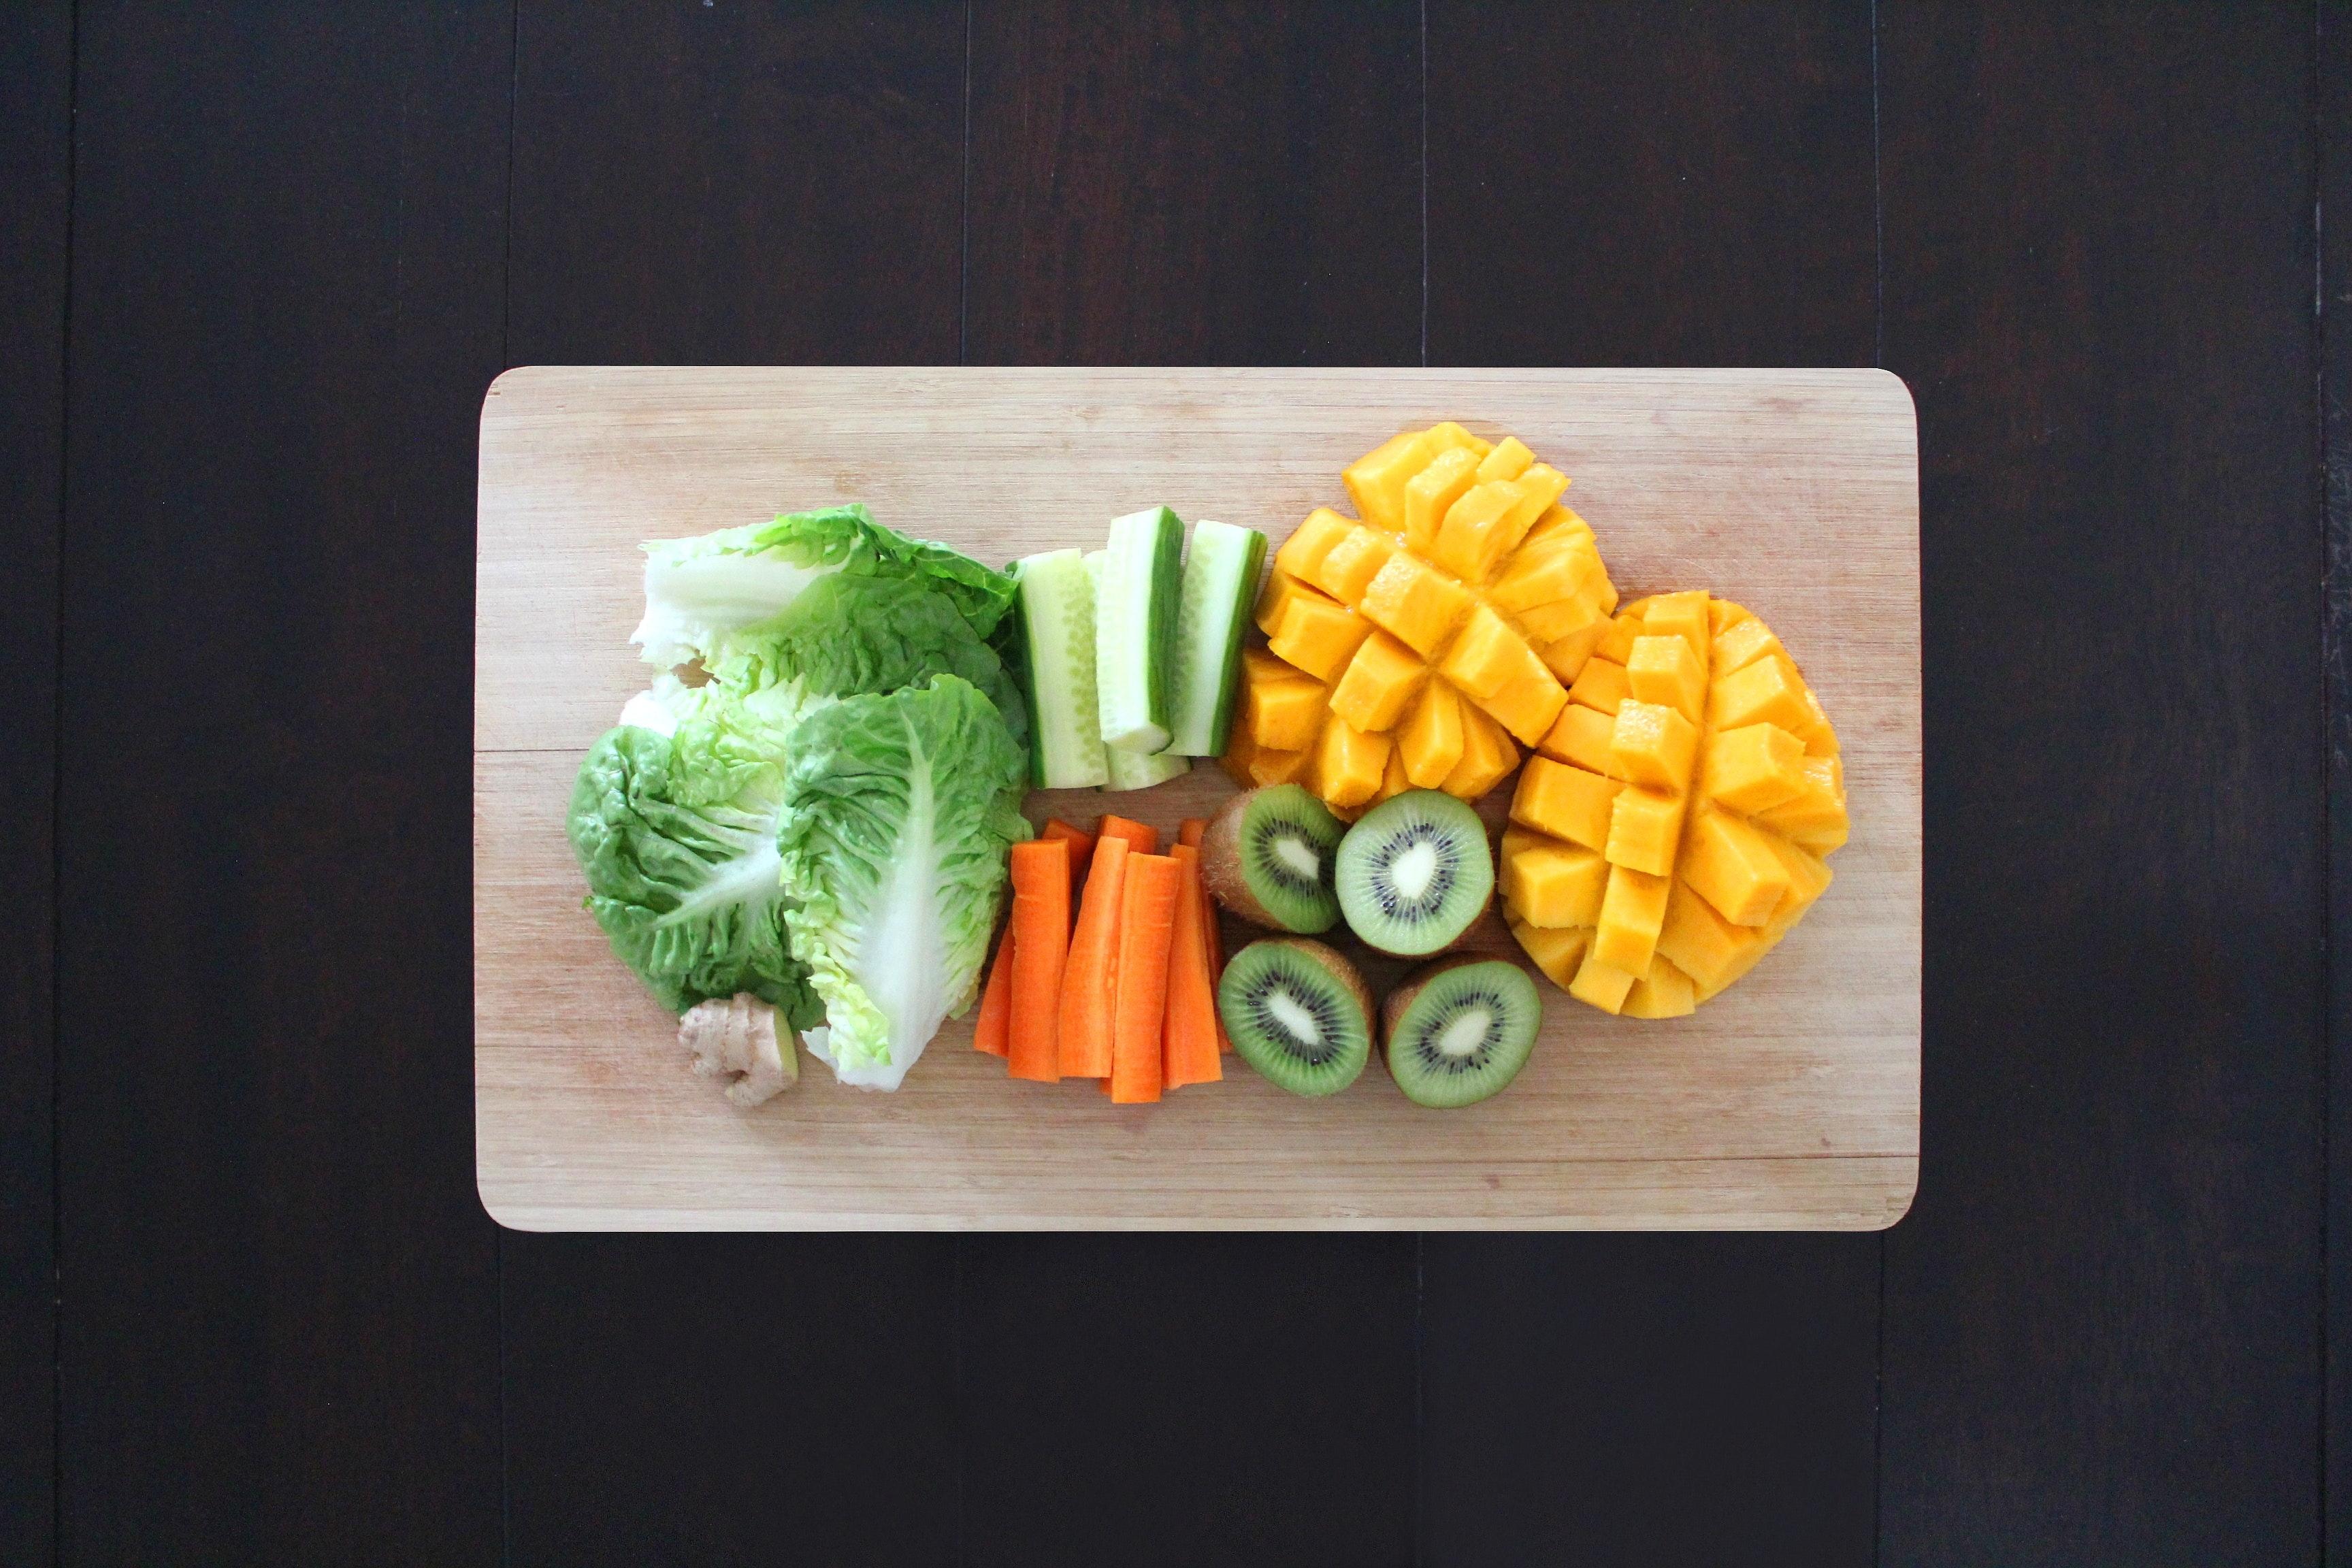 Beige Wooden Rectangular Chopping Board, Chopping board, Leaf, Wood, Vegetables, HQ Photo